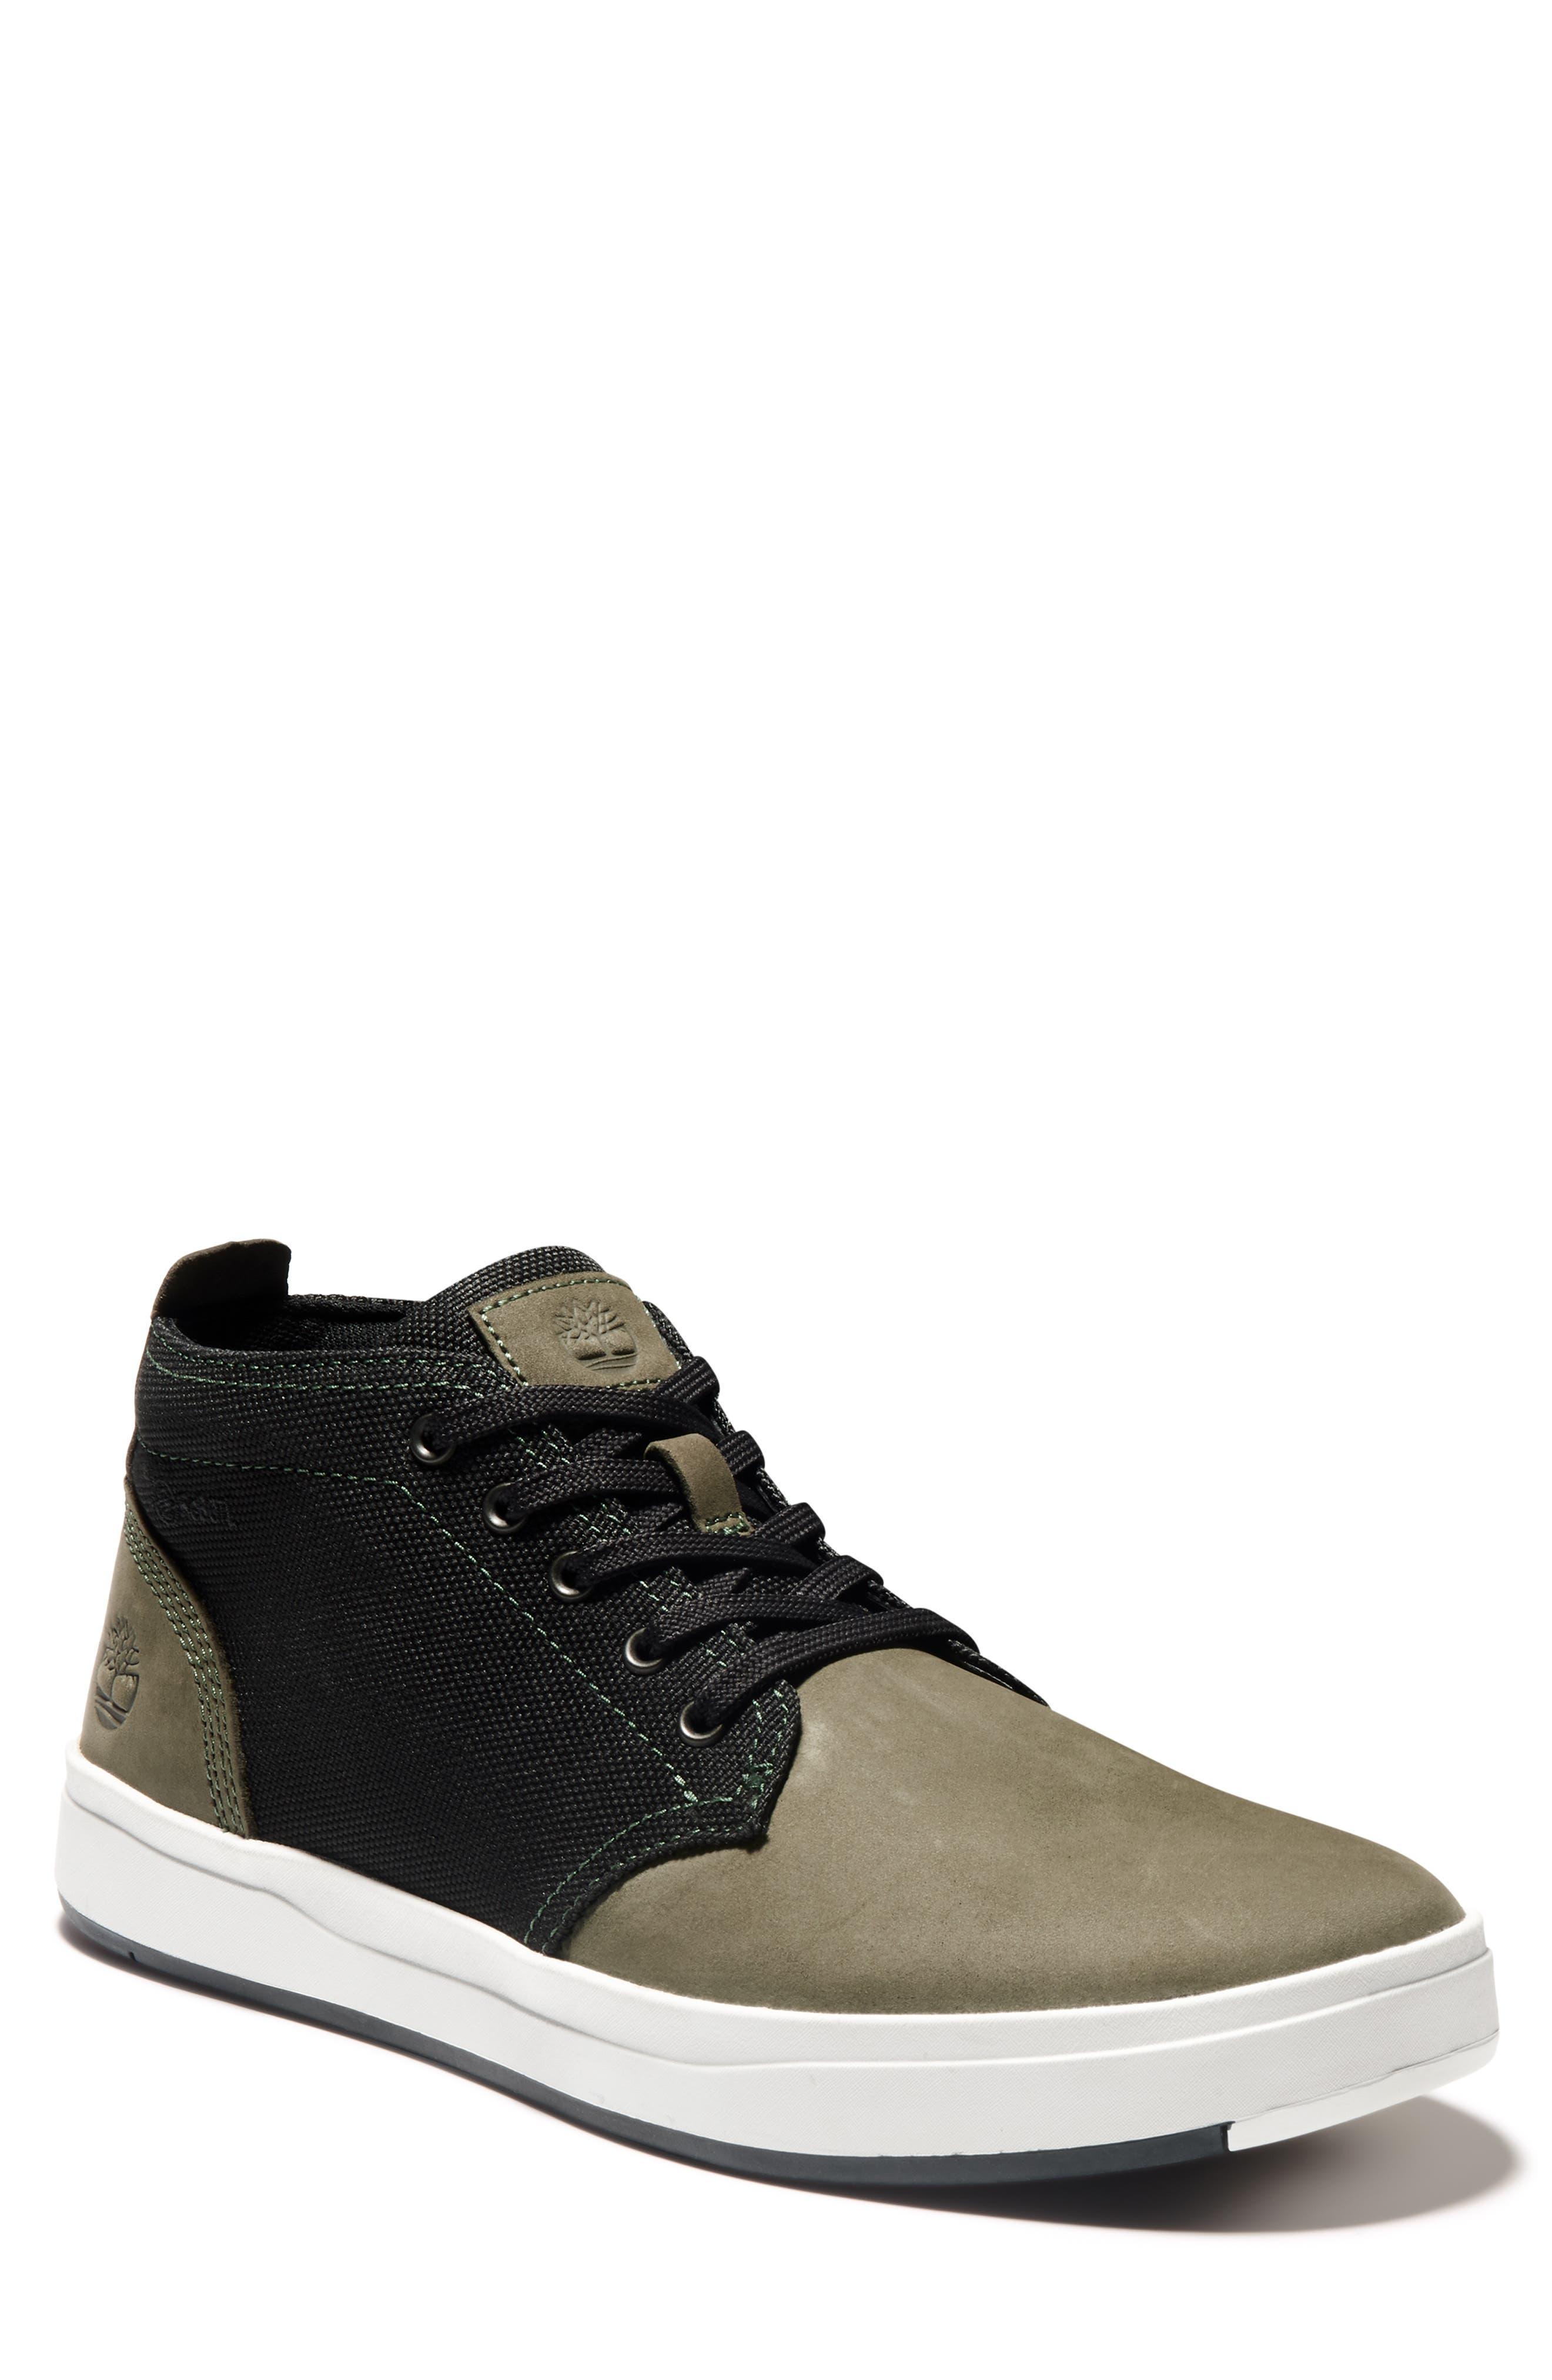 Men's Timberland Shoes Sale \u0026 Clearance